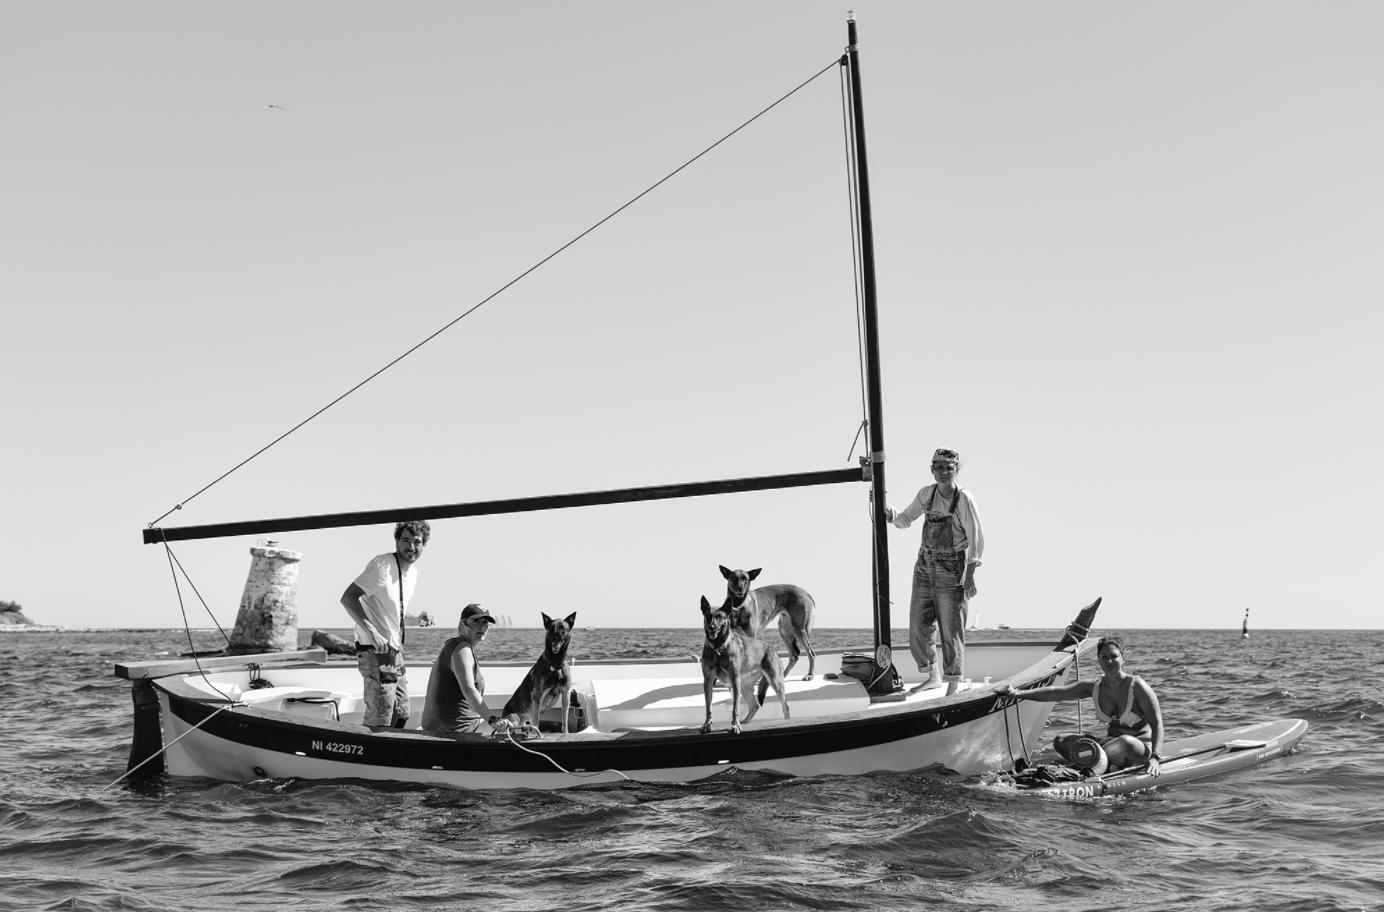 Beside Sport - Nikos Aliagas face à la mer - Chiens de mer – Phare de Batéguier, Cannes ©Nikos Aliagas -